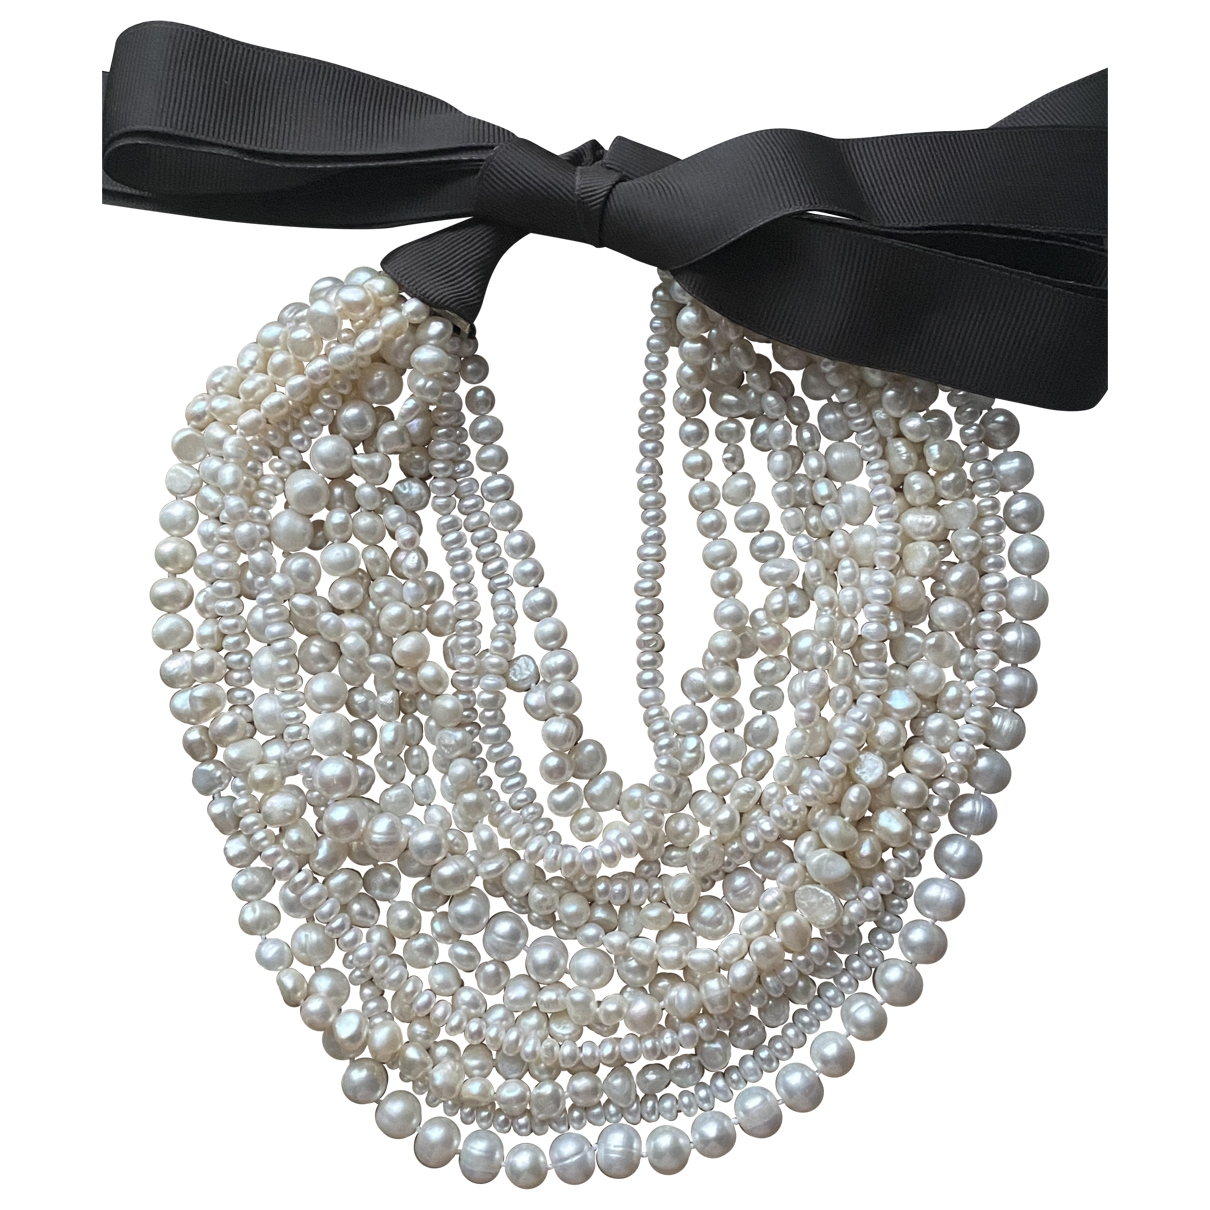 Collar Art Deco de Perlas Non Signe / Unsigned